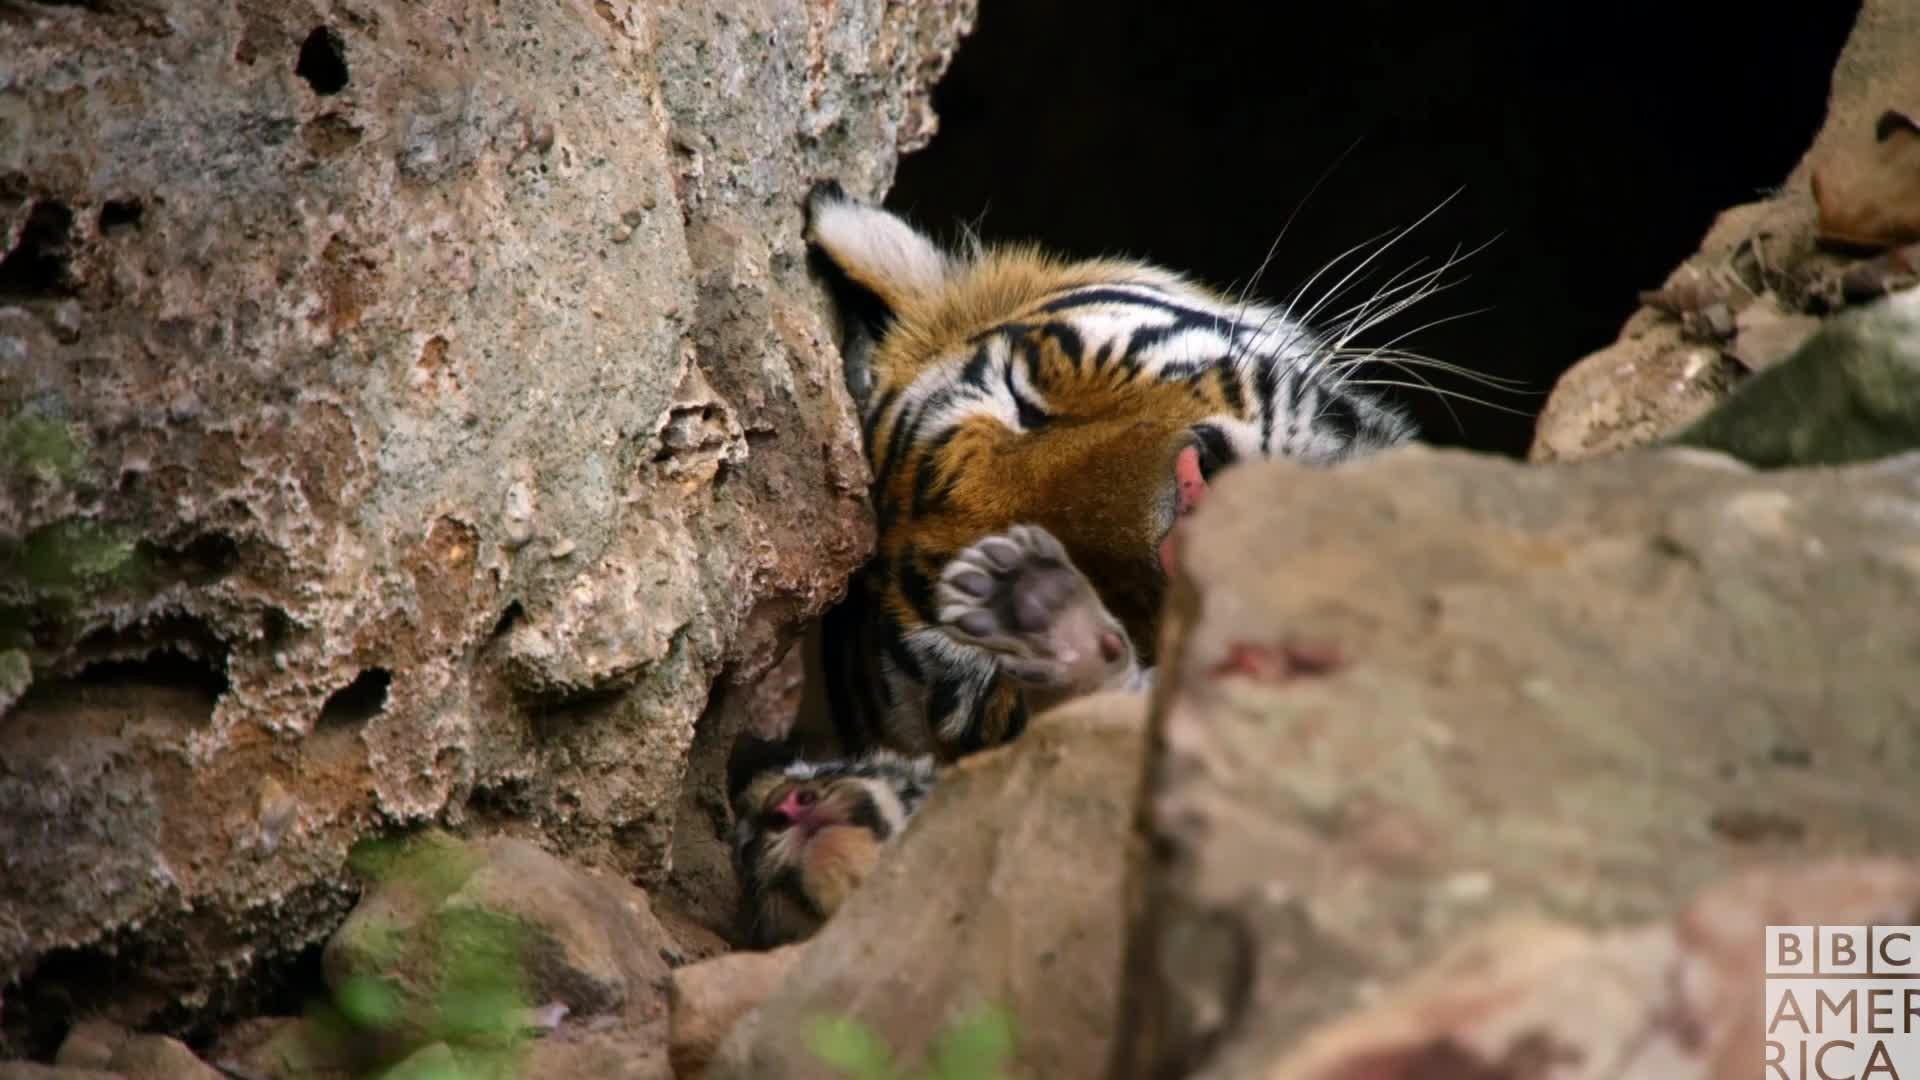 animal, animals, bbc america, bbc america dynasties, bbc america: dynasties, dynasties, sleep, sleepy, tiger, tigers, tired, zzz, Dynasties Tiger Cub Wake Up GIFs